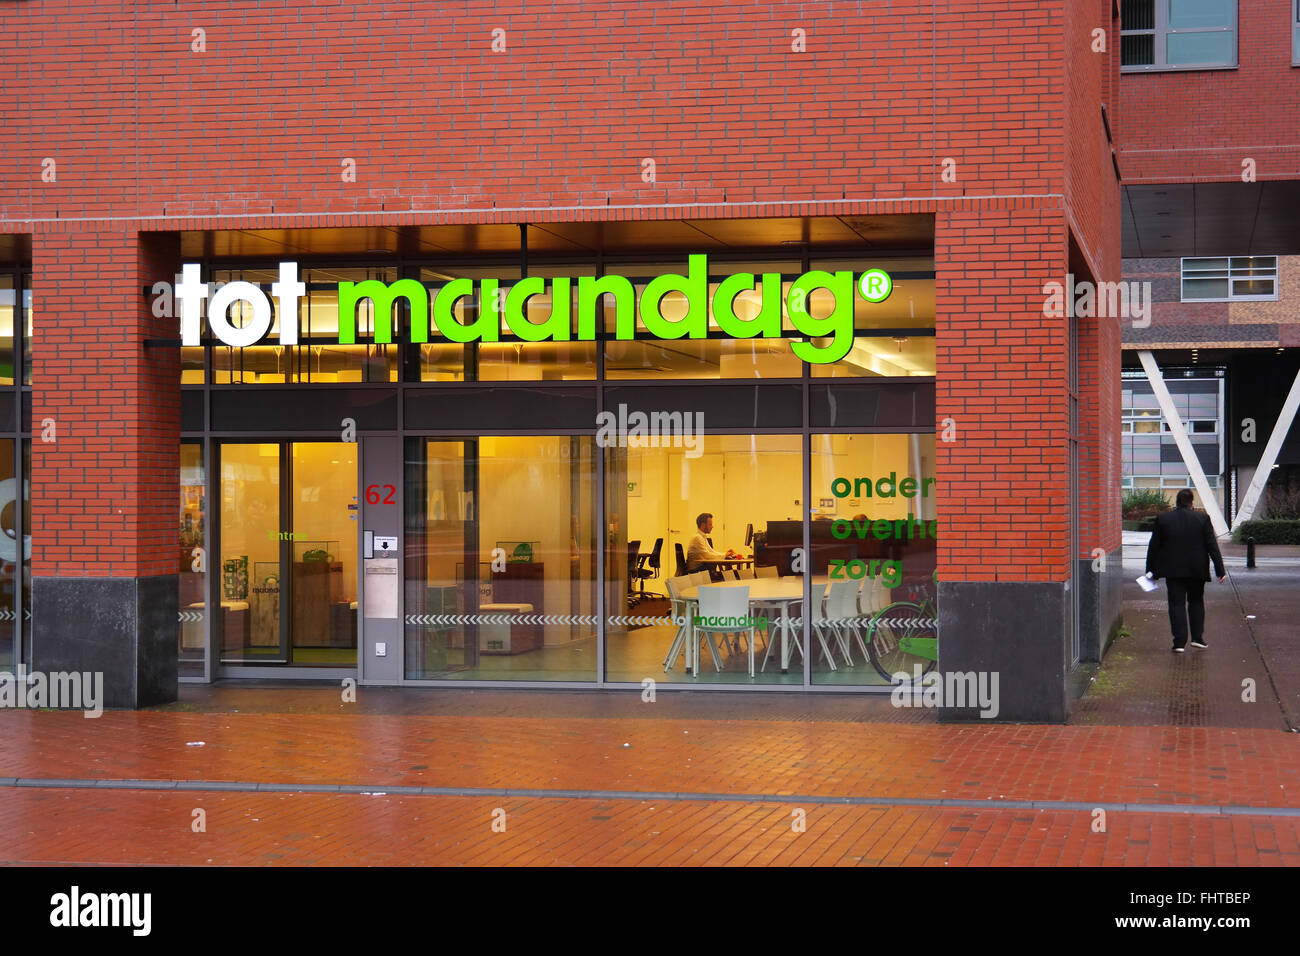 Agentur für Arbeit: Maandag tot Stockfoto